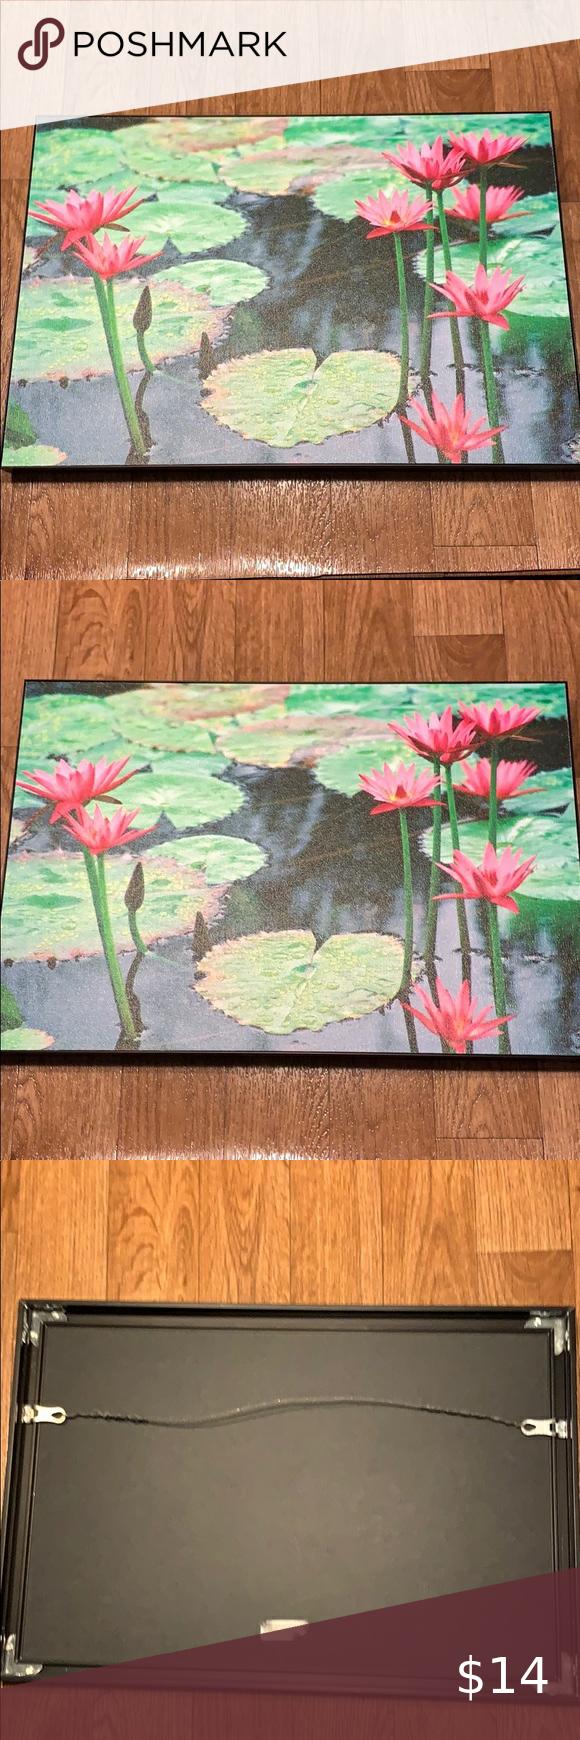 "13X19"" framed canvas painting w/ black metal frame 13X19 inches framed canvas painting with black metal frame. Wall Art"